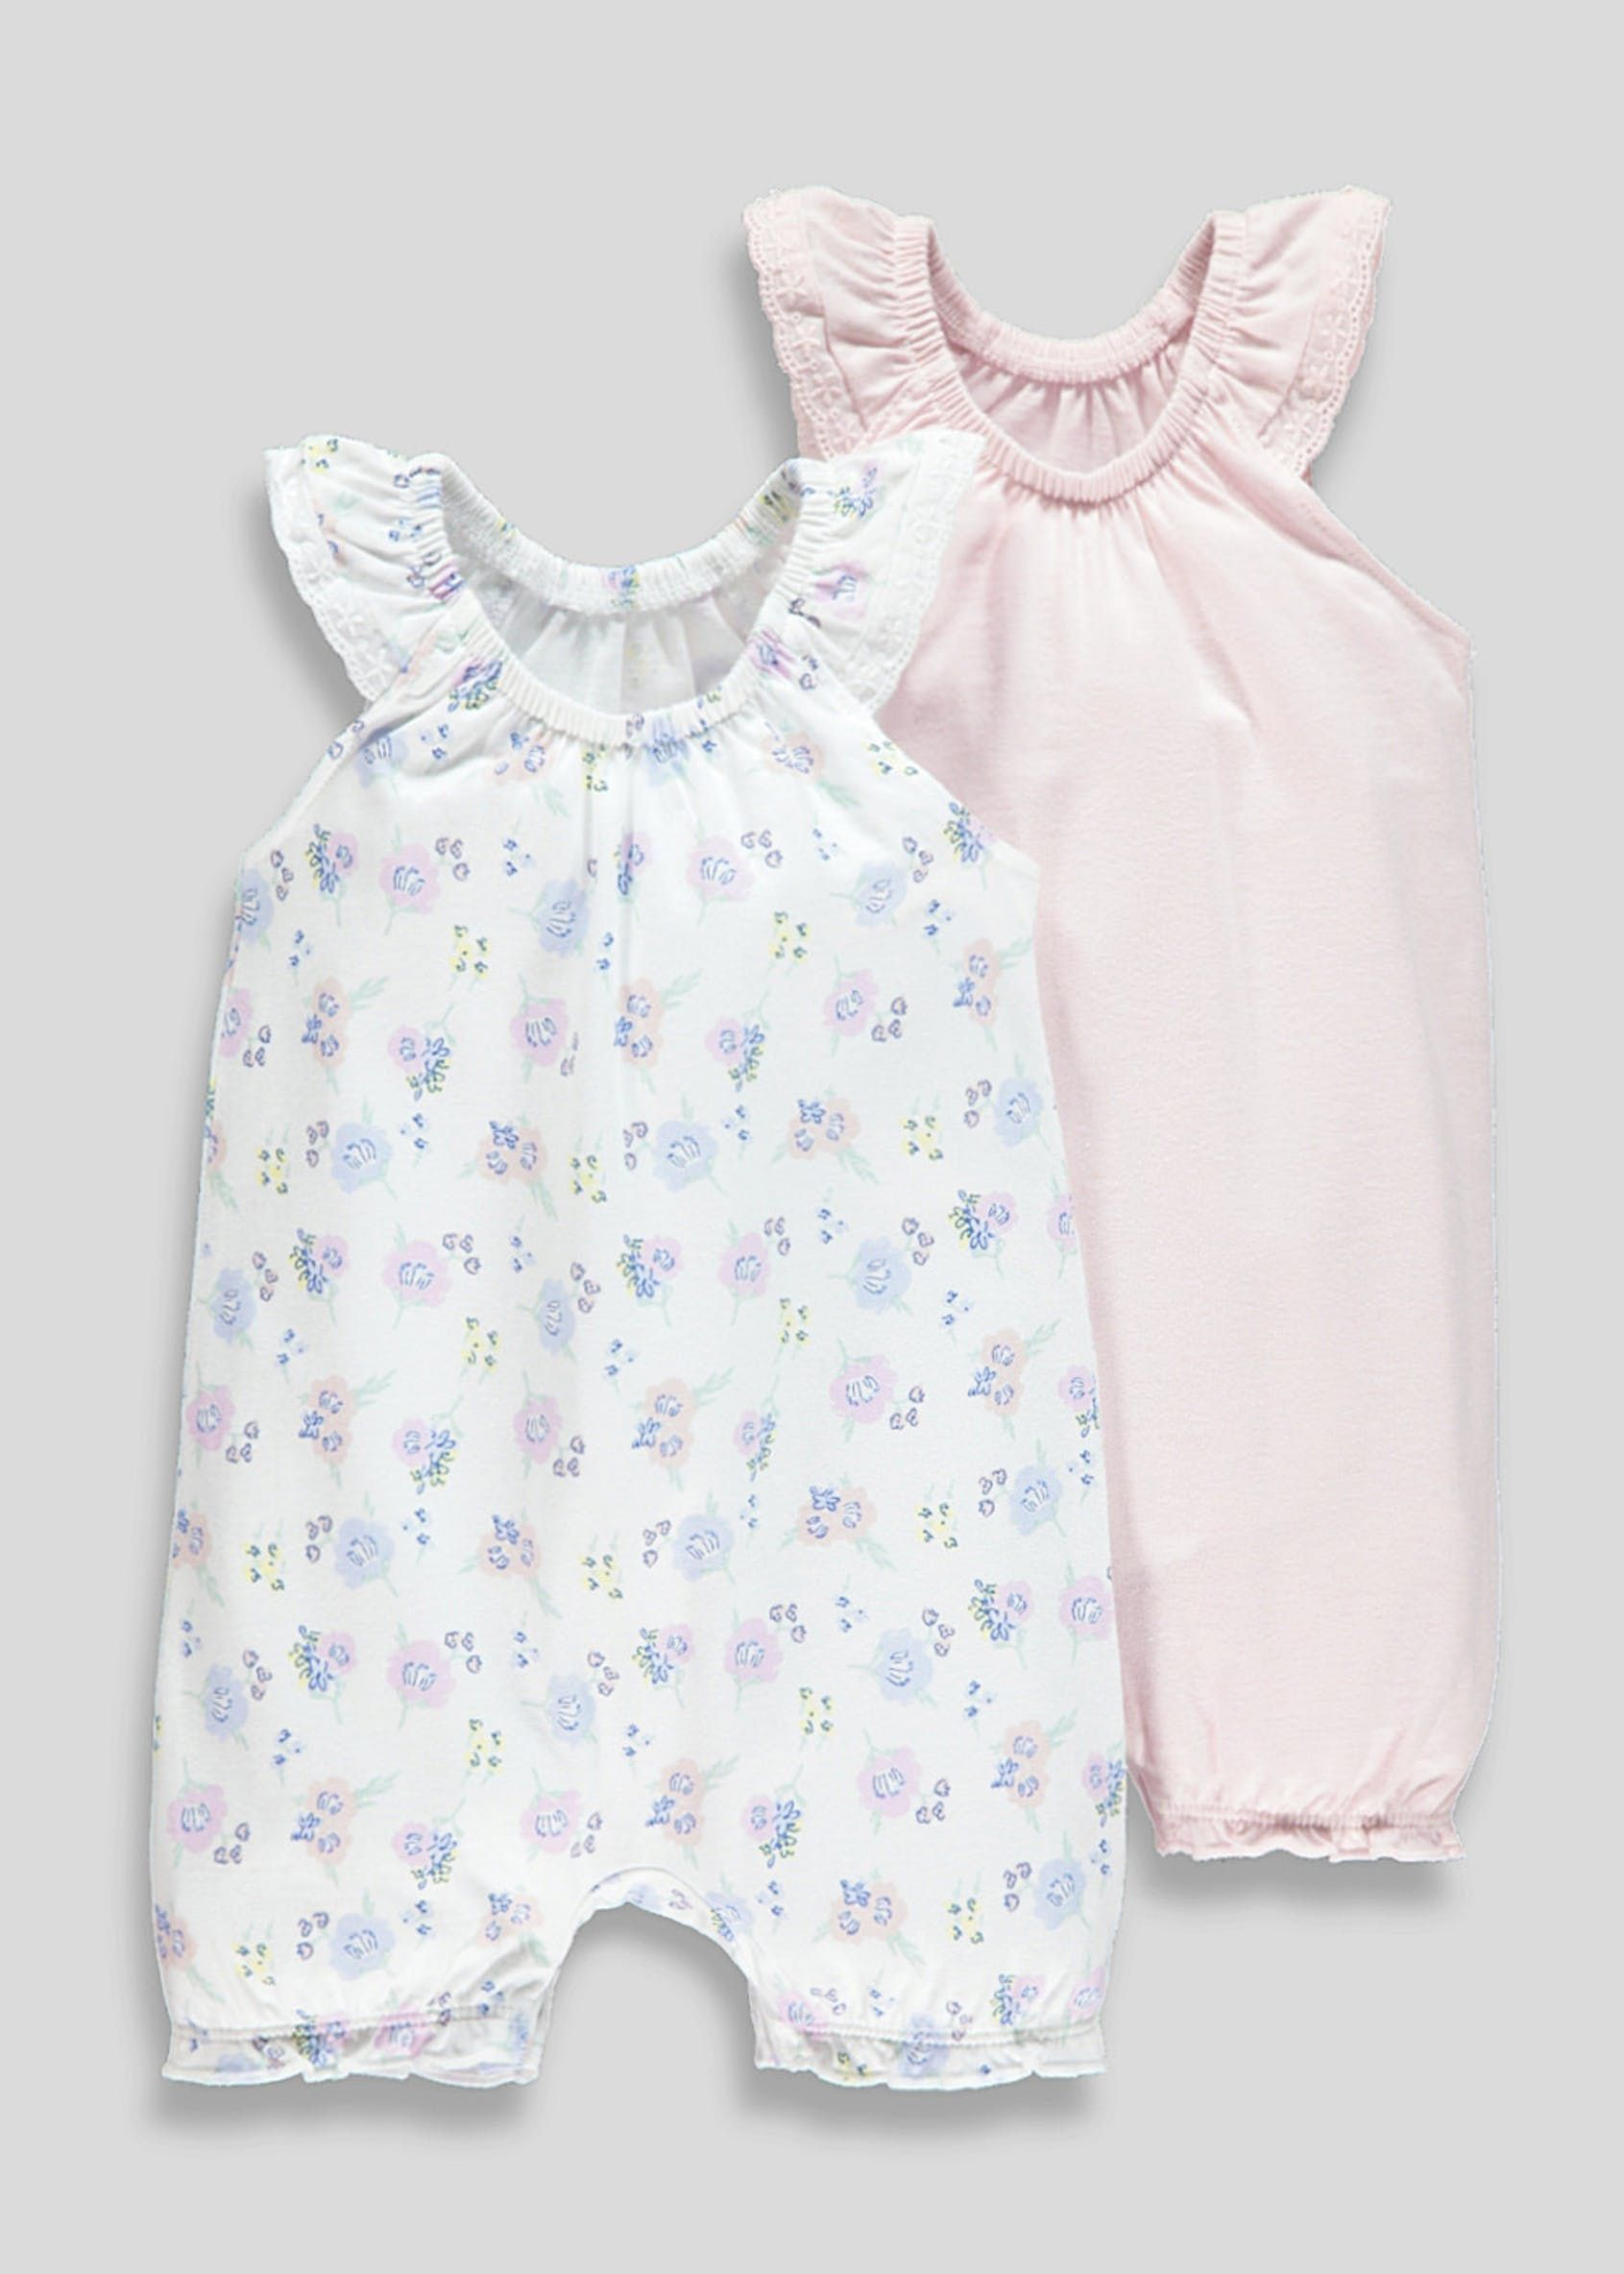 f8a03a30a5a Girls 2 Pack Shortie Rompers (Newborn-18mths) – Pink